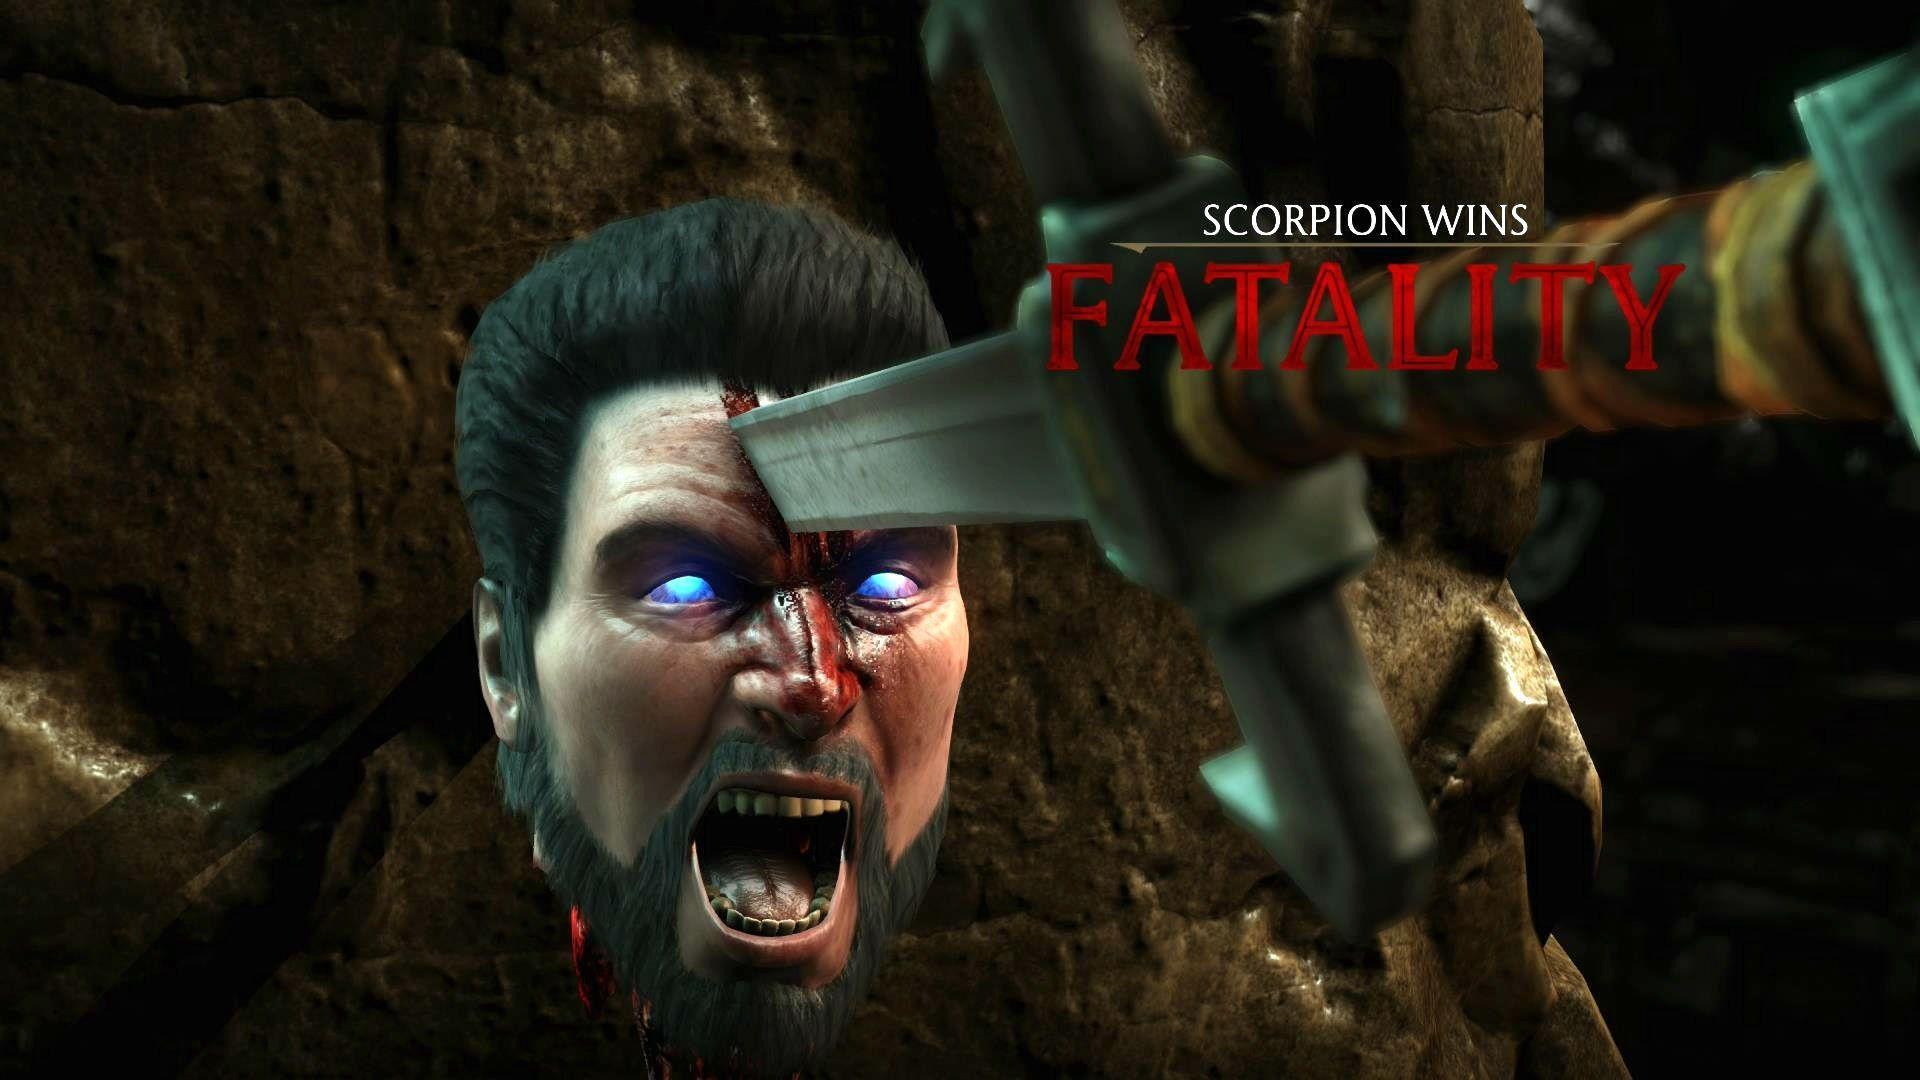 Mortal Kombat Fatality Wallpapers Top Free Mortal Kombat